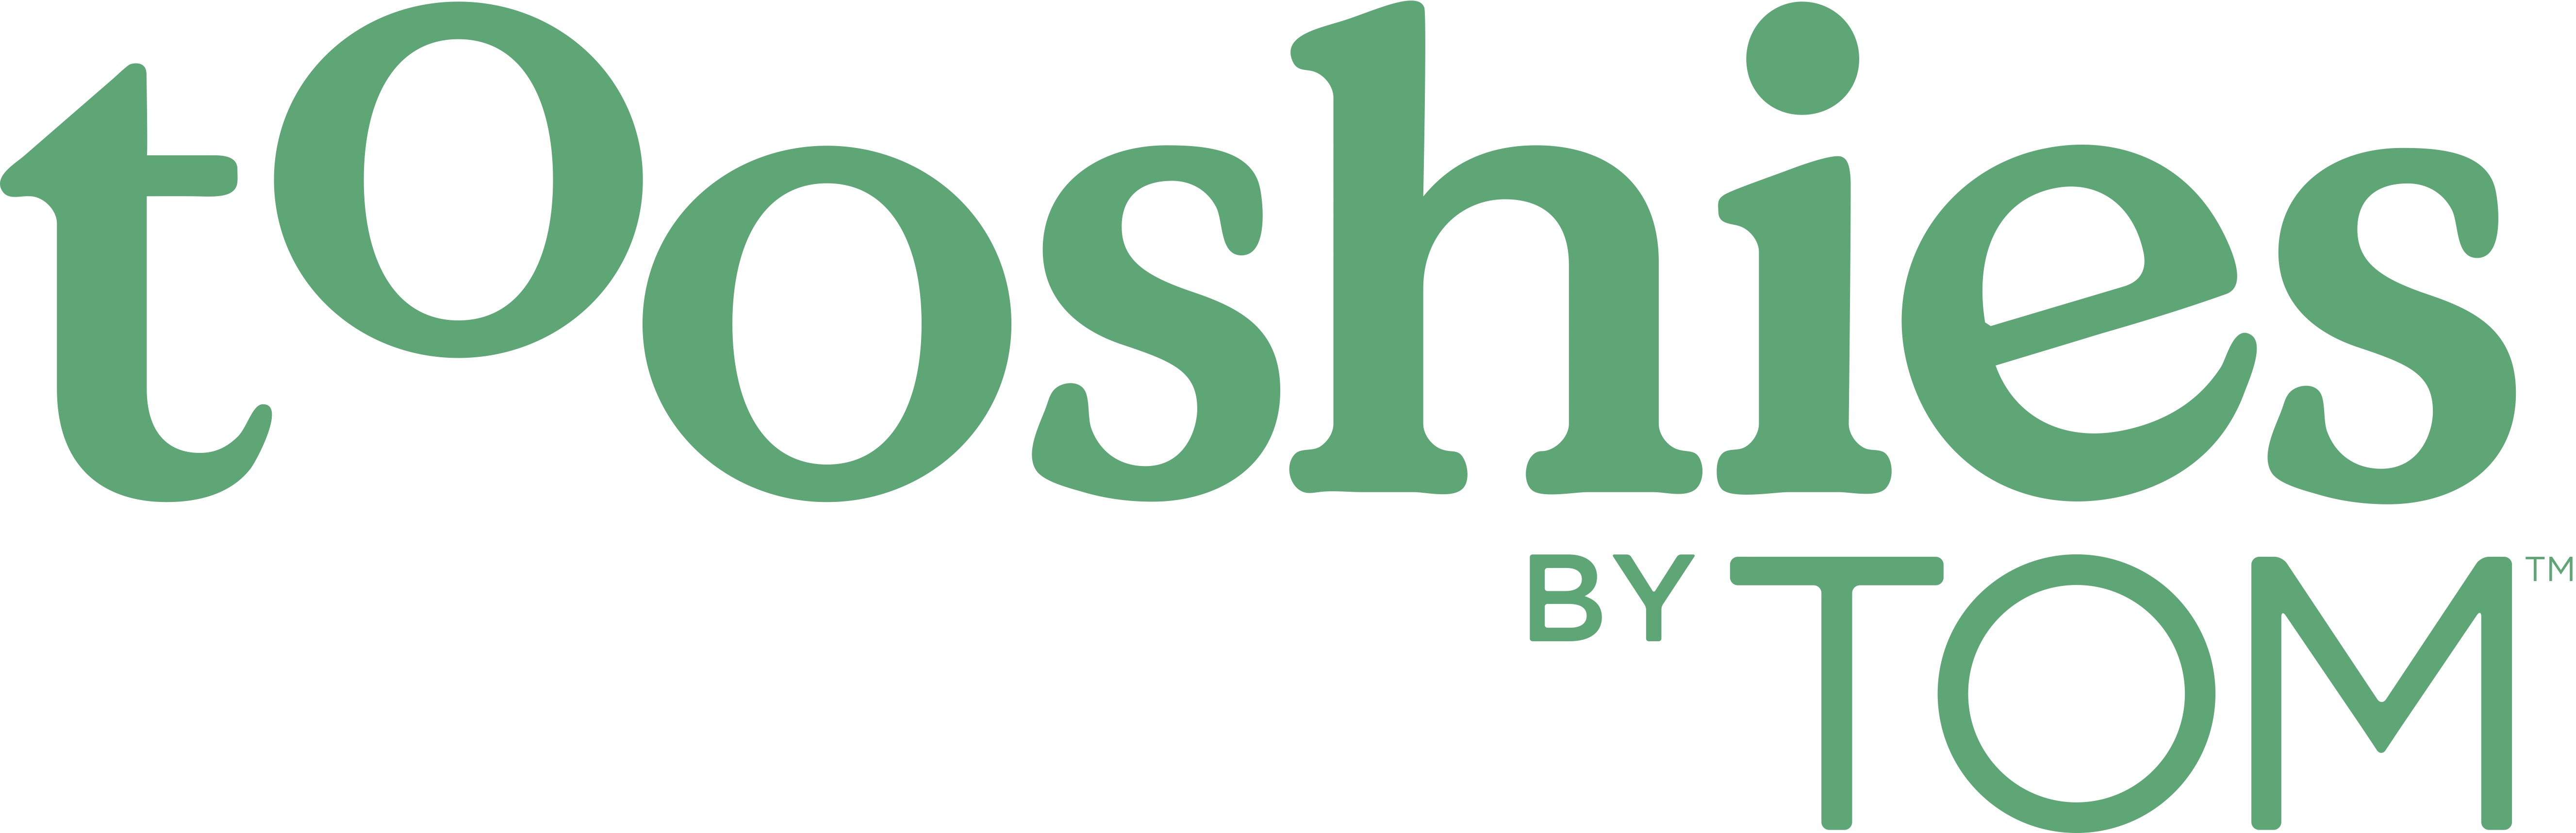 TOOSHIES_Logo_green_(1).jpg